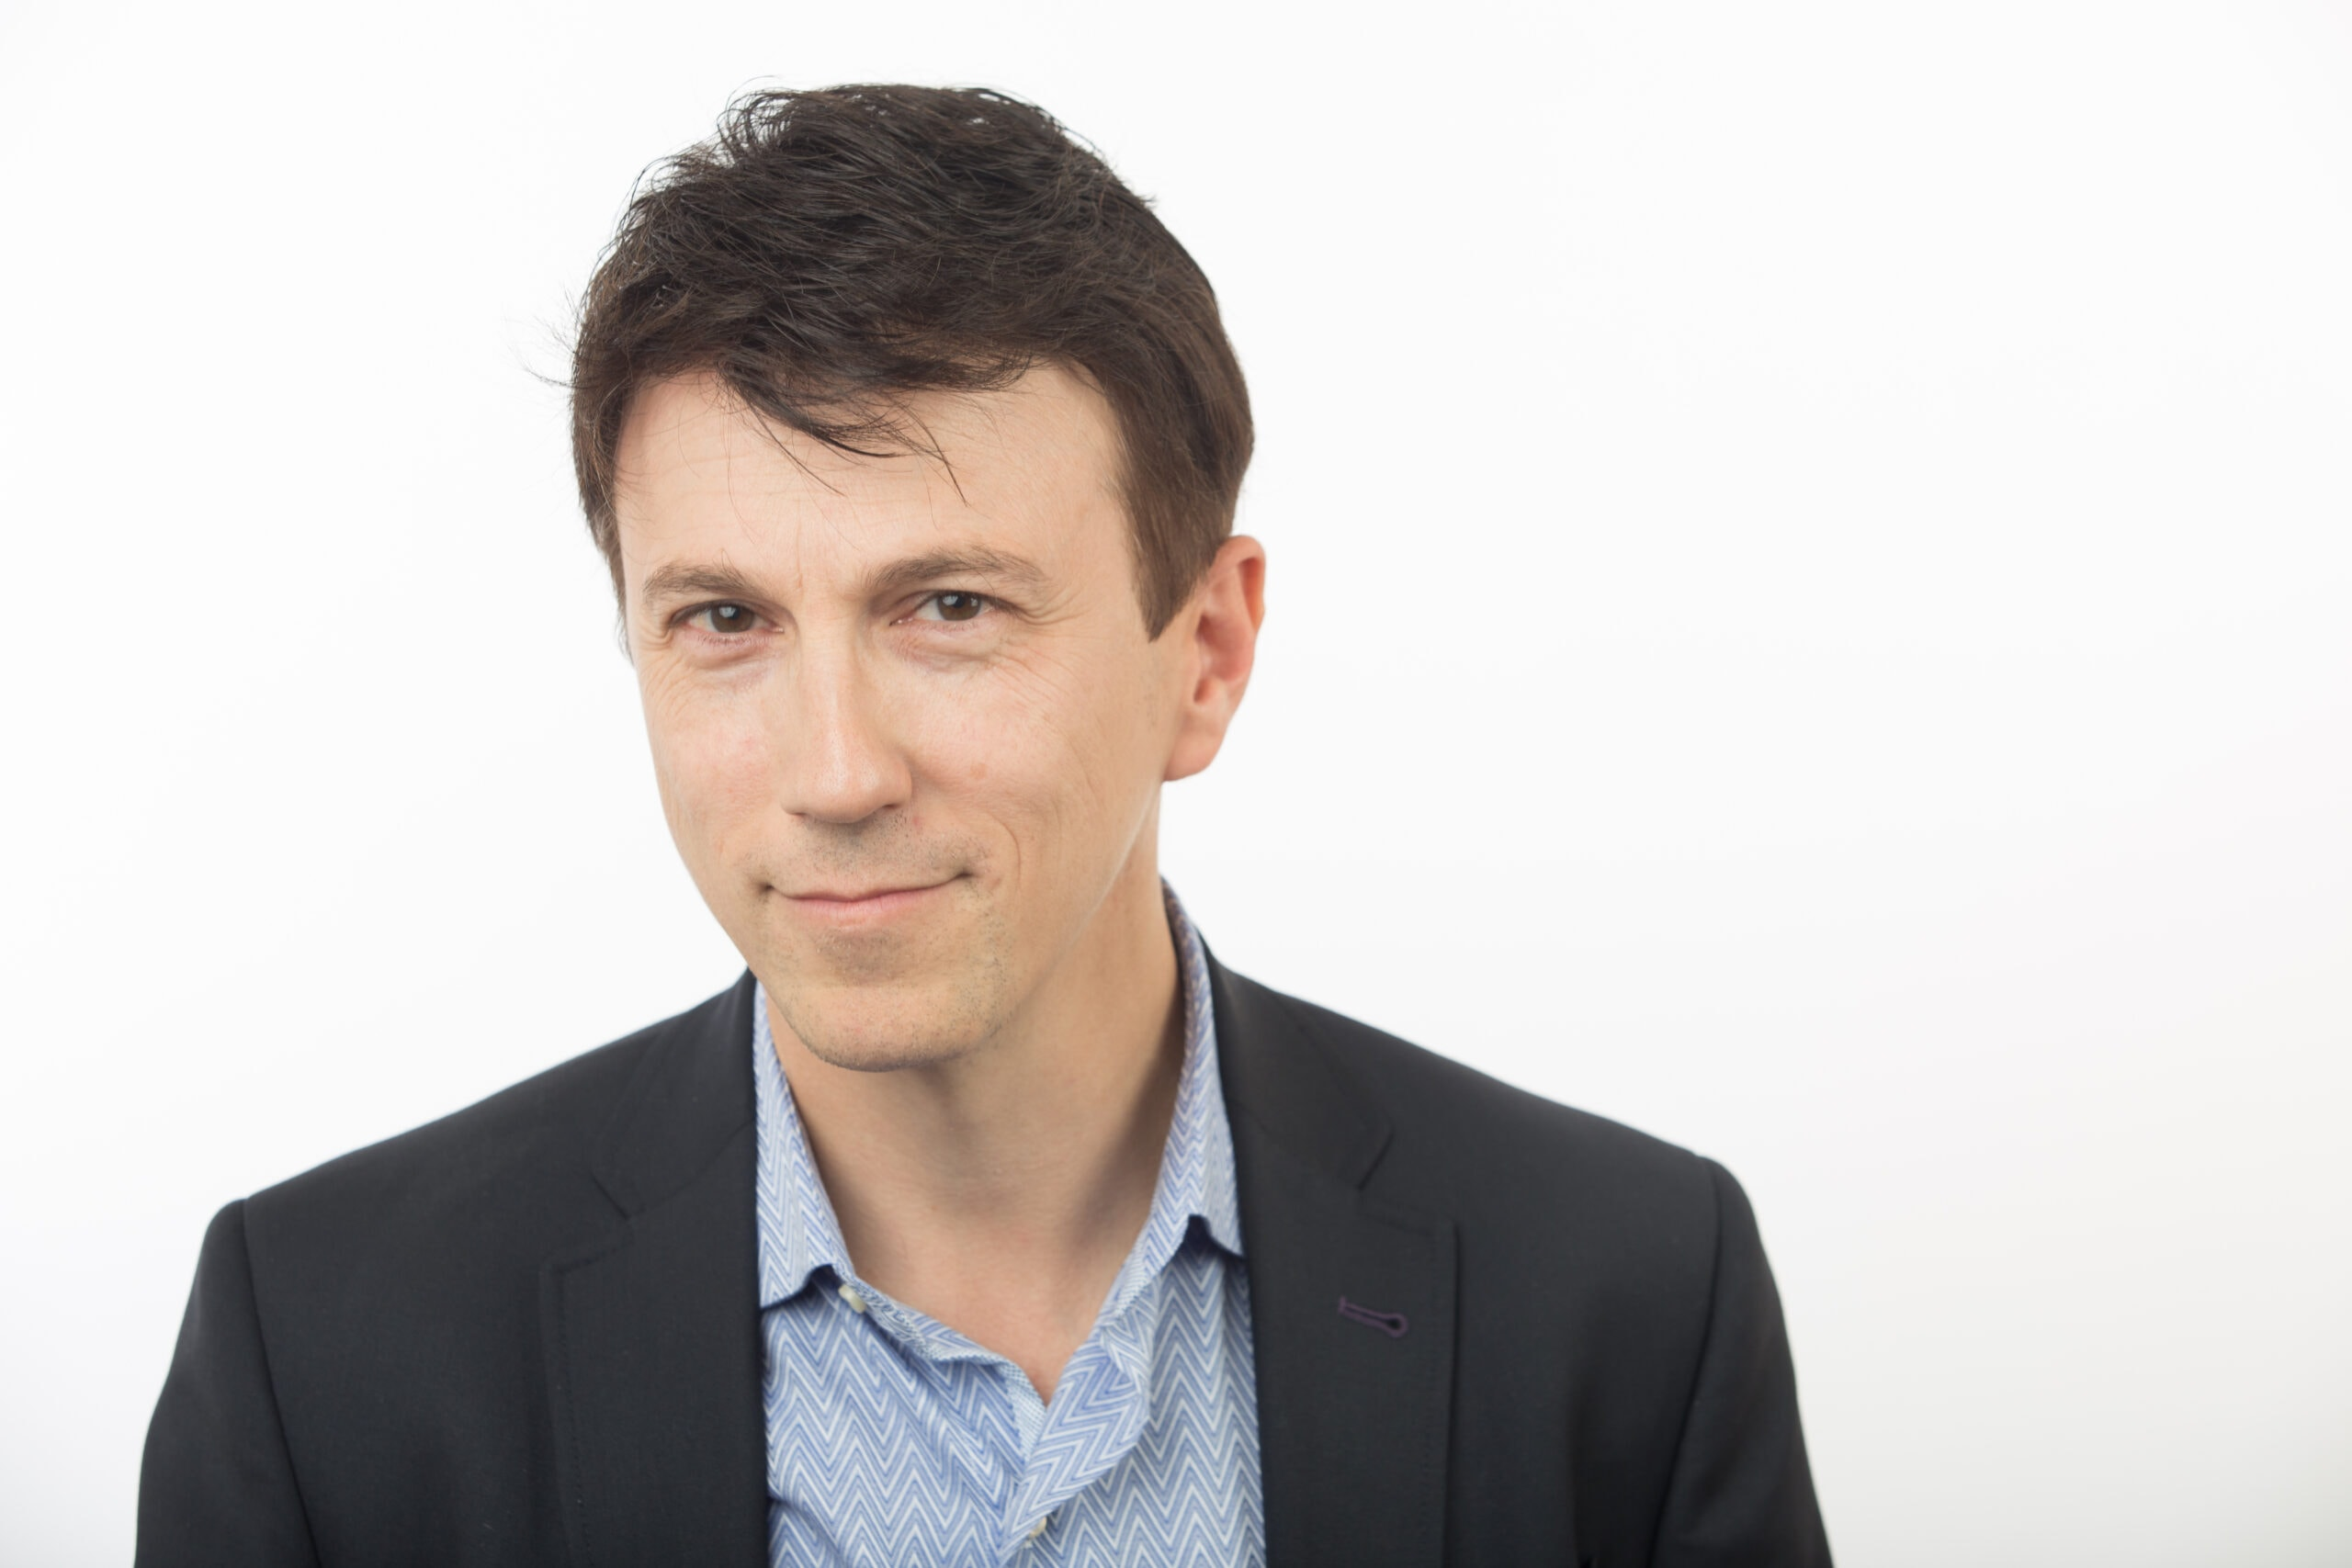 VSP Dr. Daniel | Healthcare Futurist